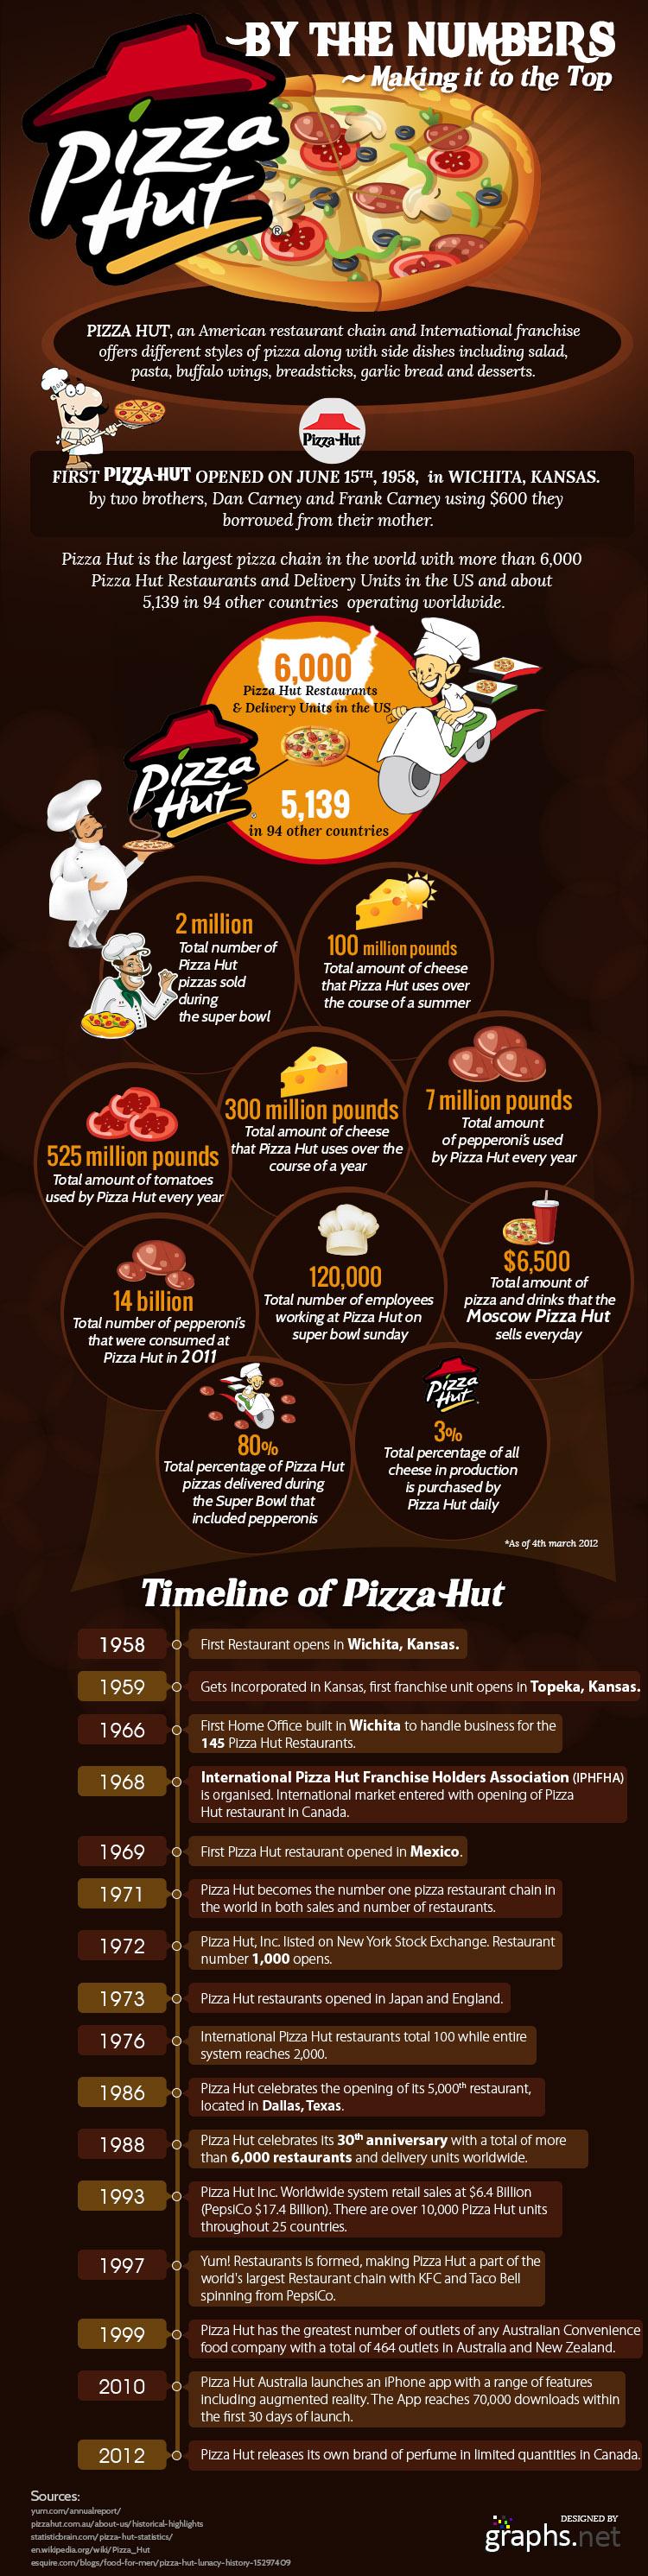 Pizza Hut The Brand Equation